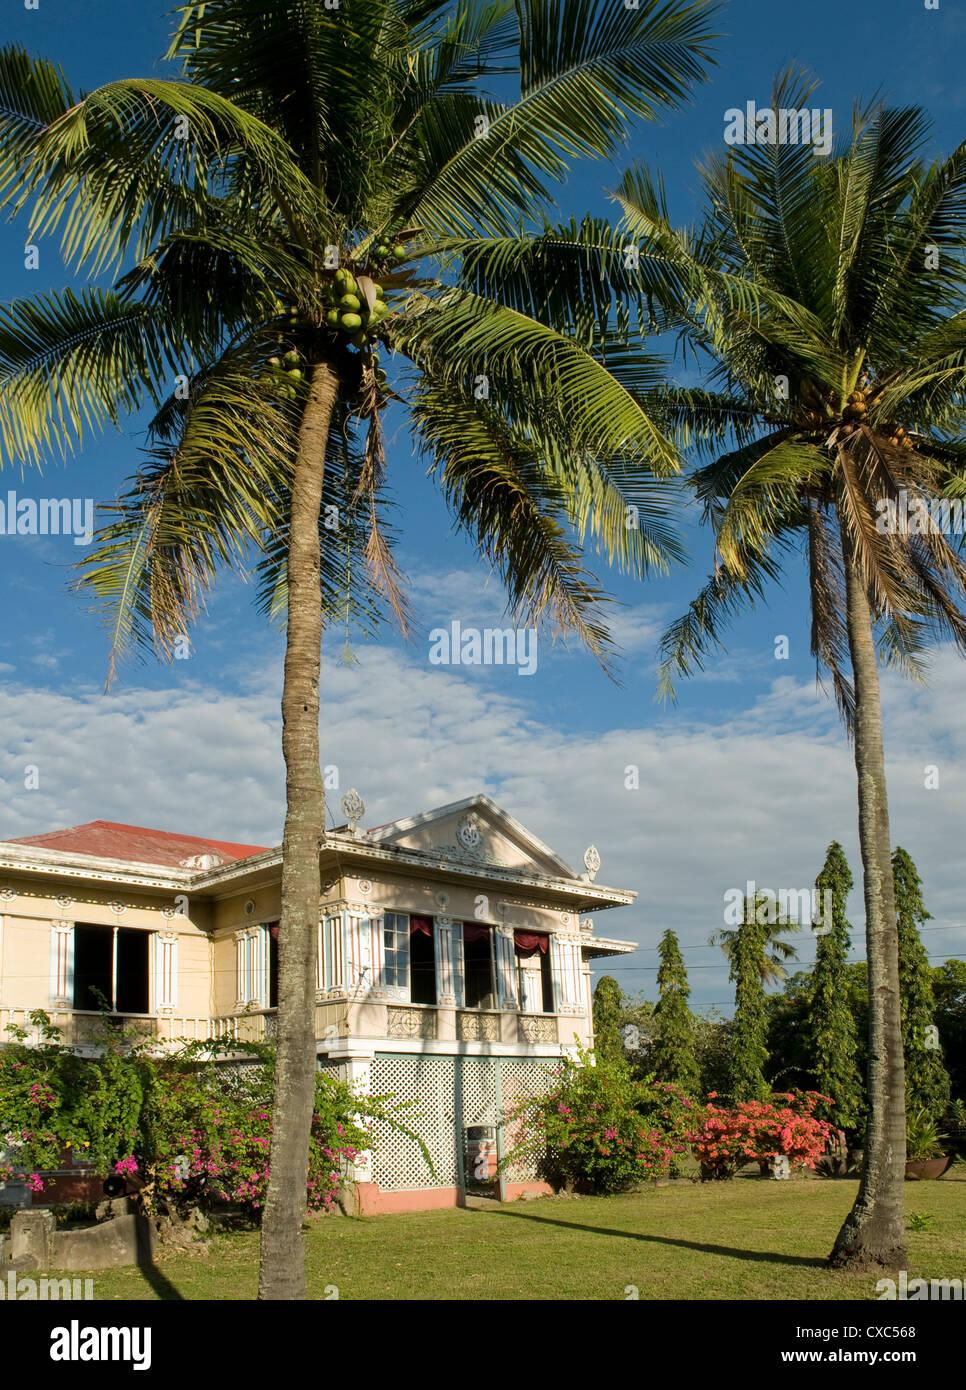 Sanson Montiola Heritage House, Iloilo, Filipinas, el sudeste de Asia, Asia Foto de stock